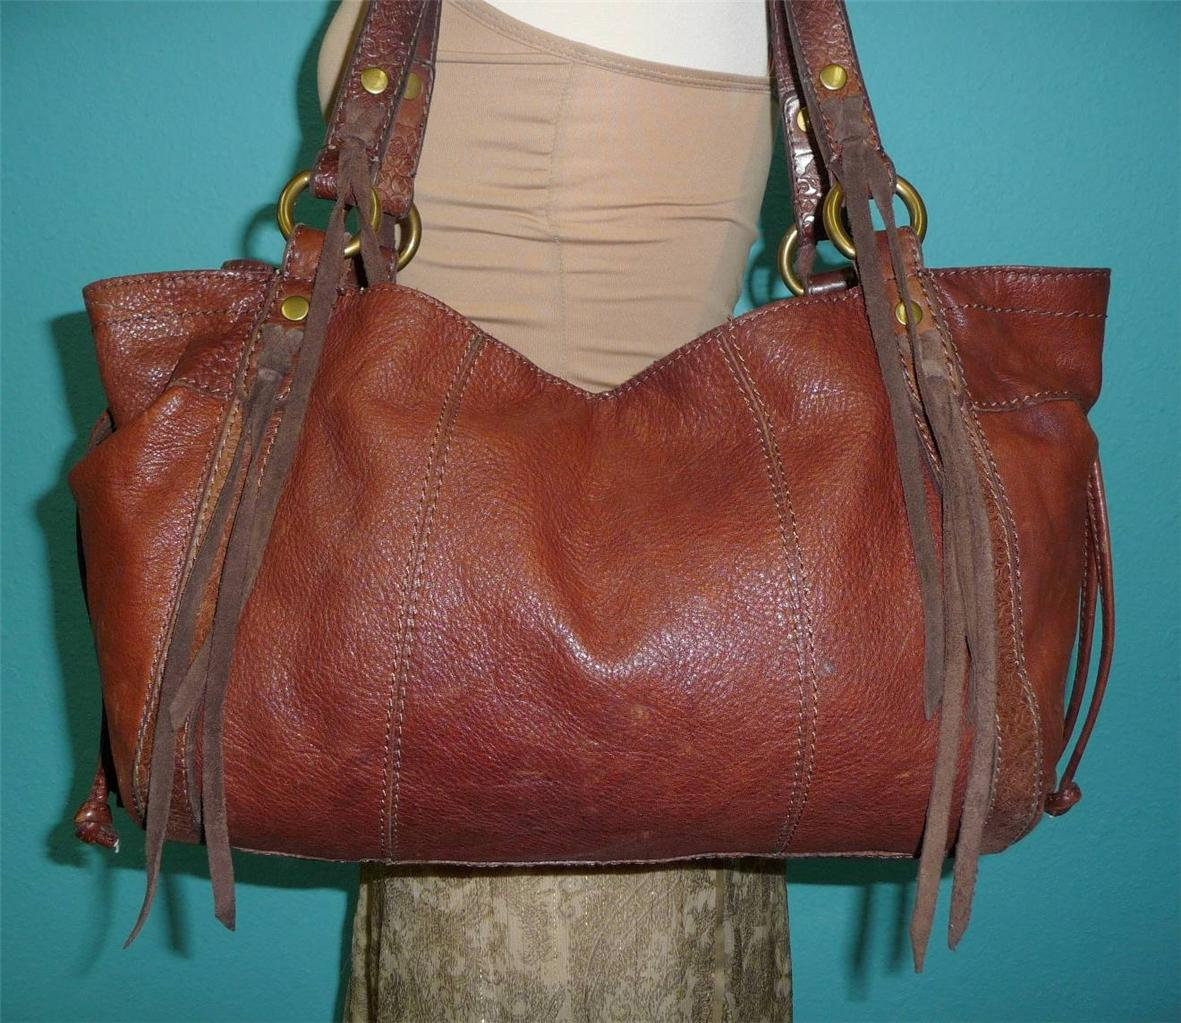 Anuschka Hand Painted Leather East West Zip Top Shoulder Bag W Wallet